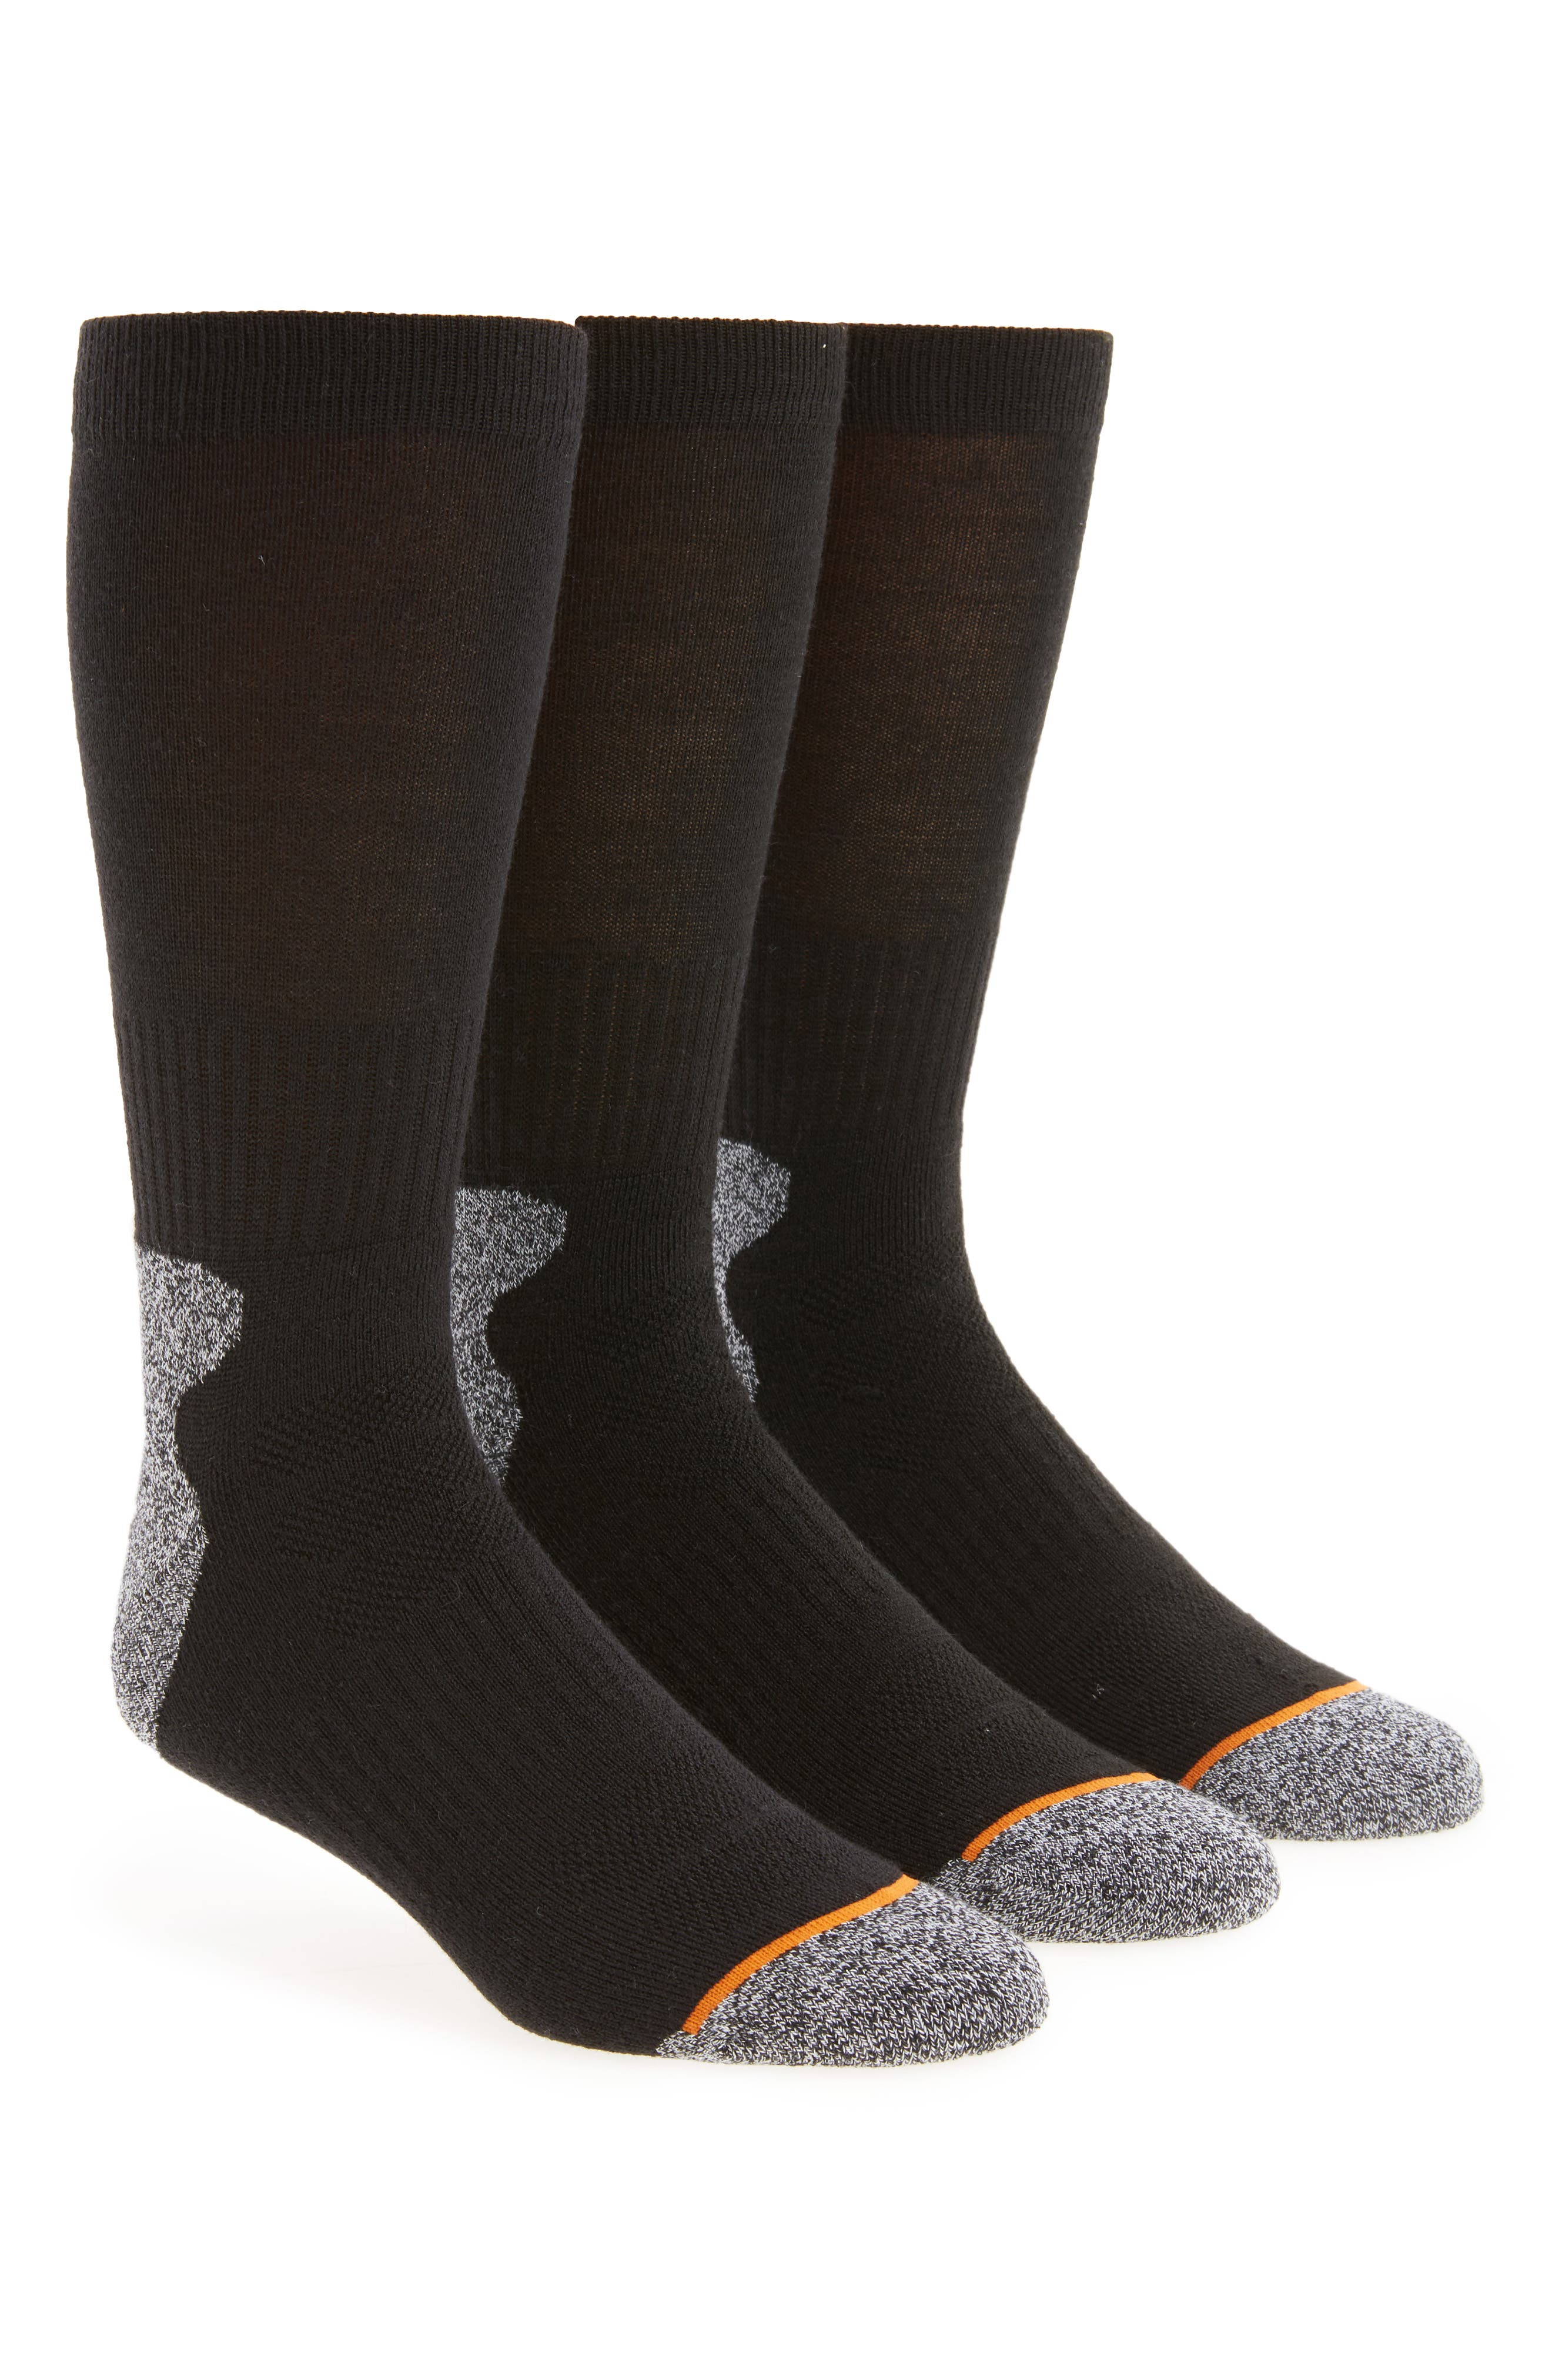 3-Pack Assorted Boot Socks,                         Main,                         color, Black